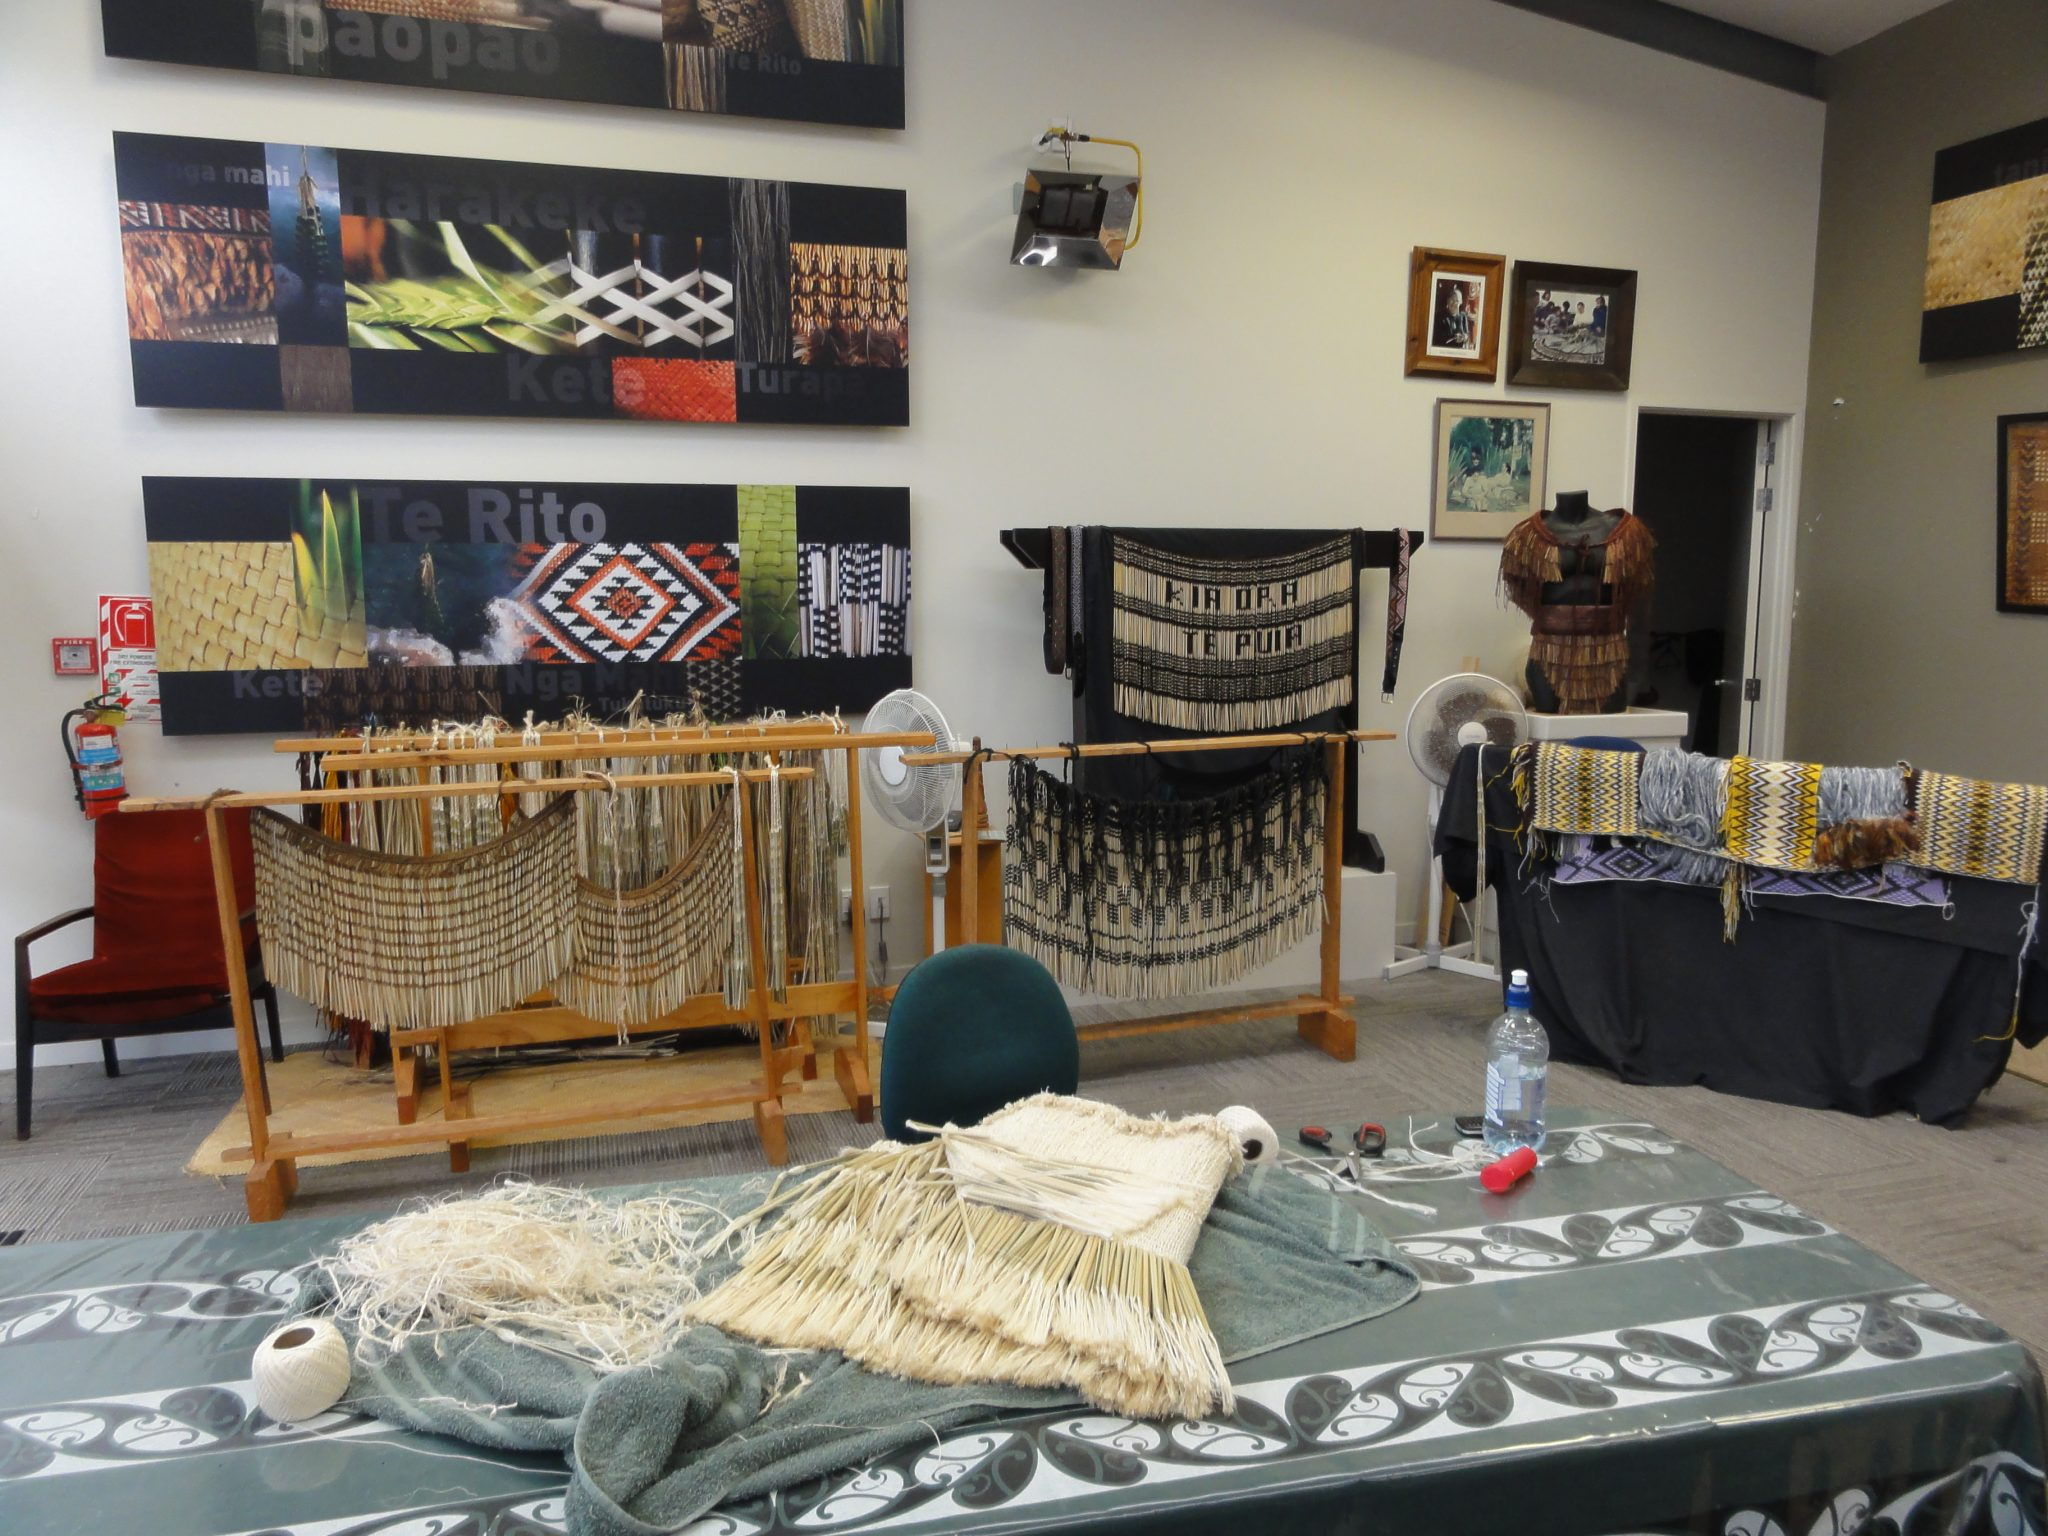 Maori weaving school at Whakarewarewa, Rotorua, New Zealand By Andy king50 (Own work) [CC BY-SA 3.0]